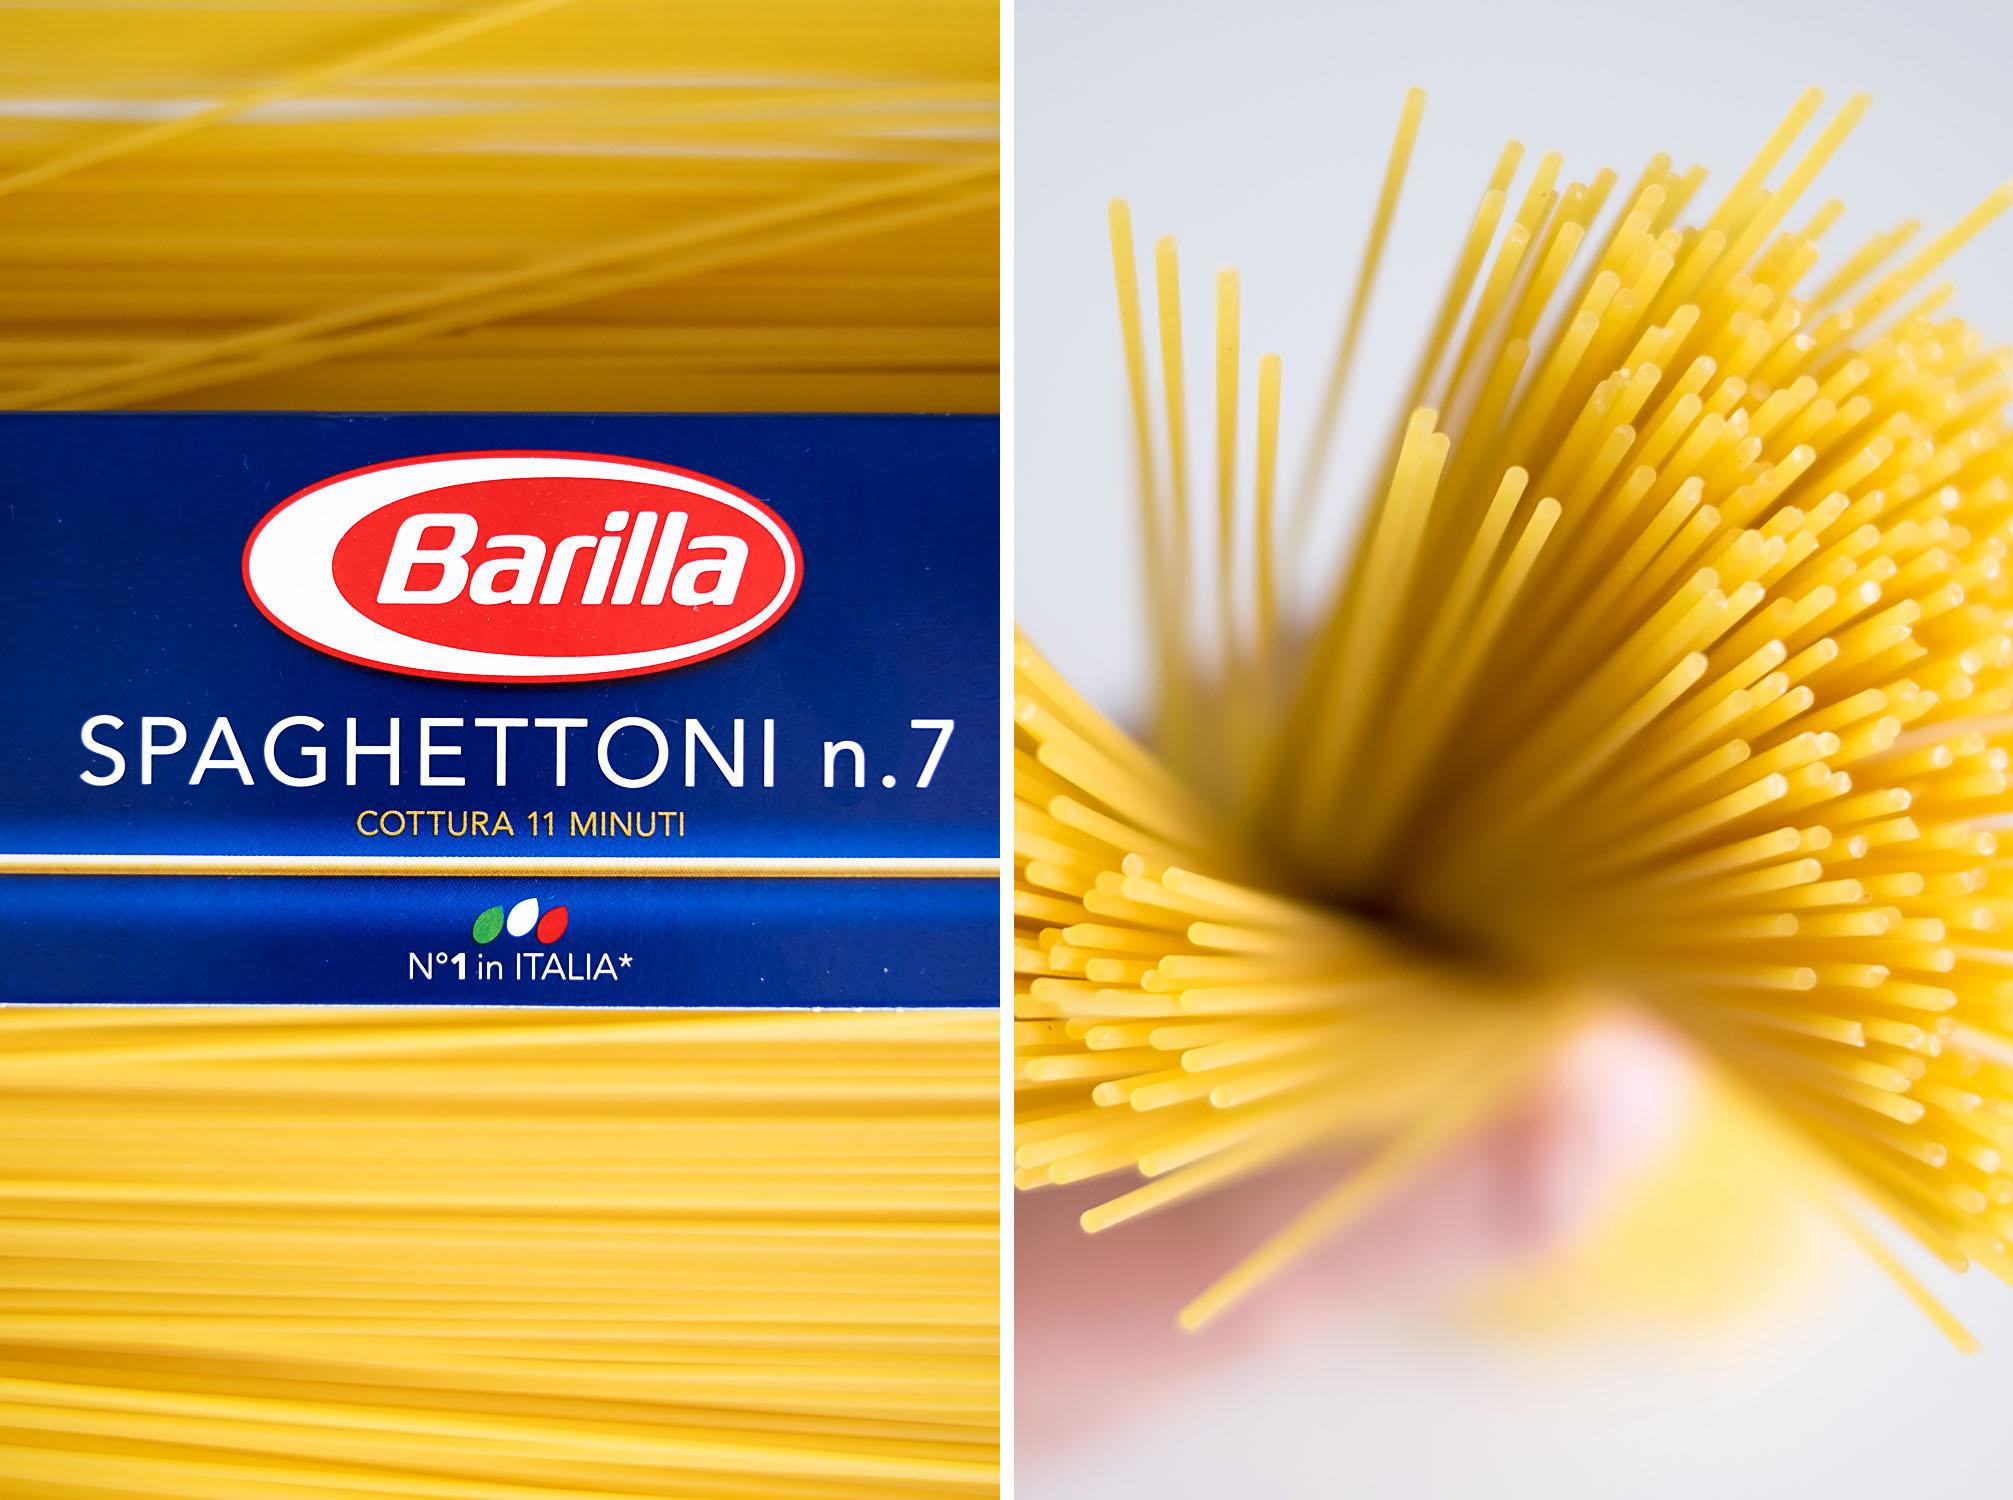 Spaghetti Barilla with Rocket and Walnut Pesto Sauce {recipe and photography by Mondomulia}